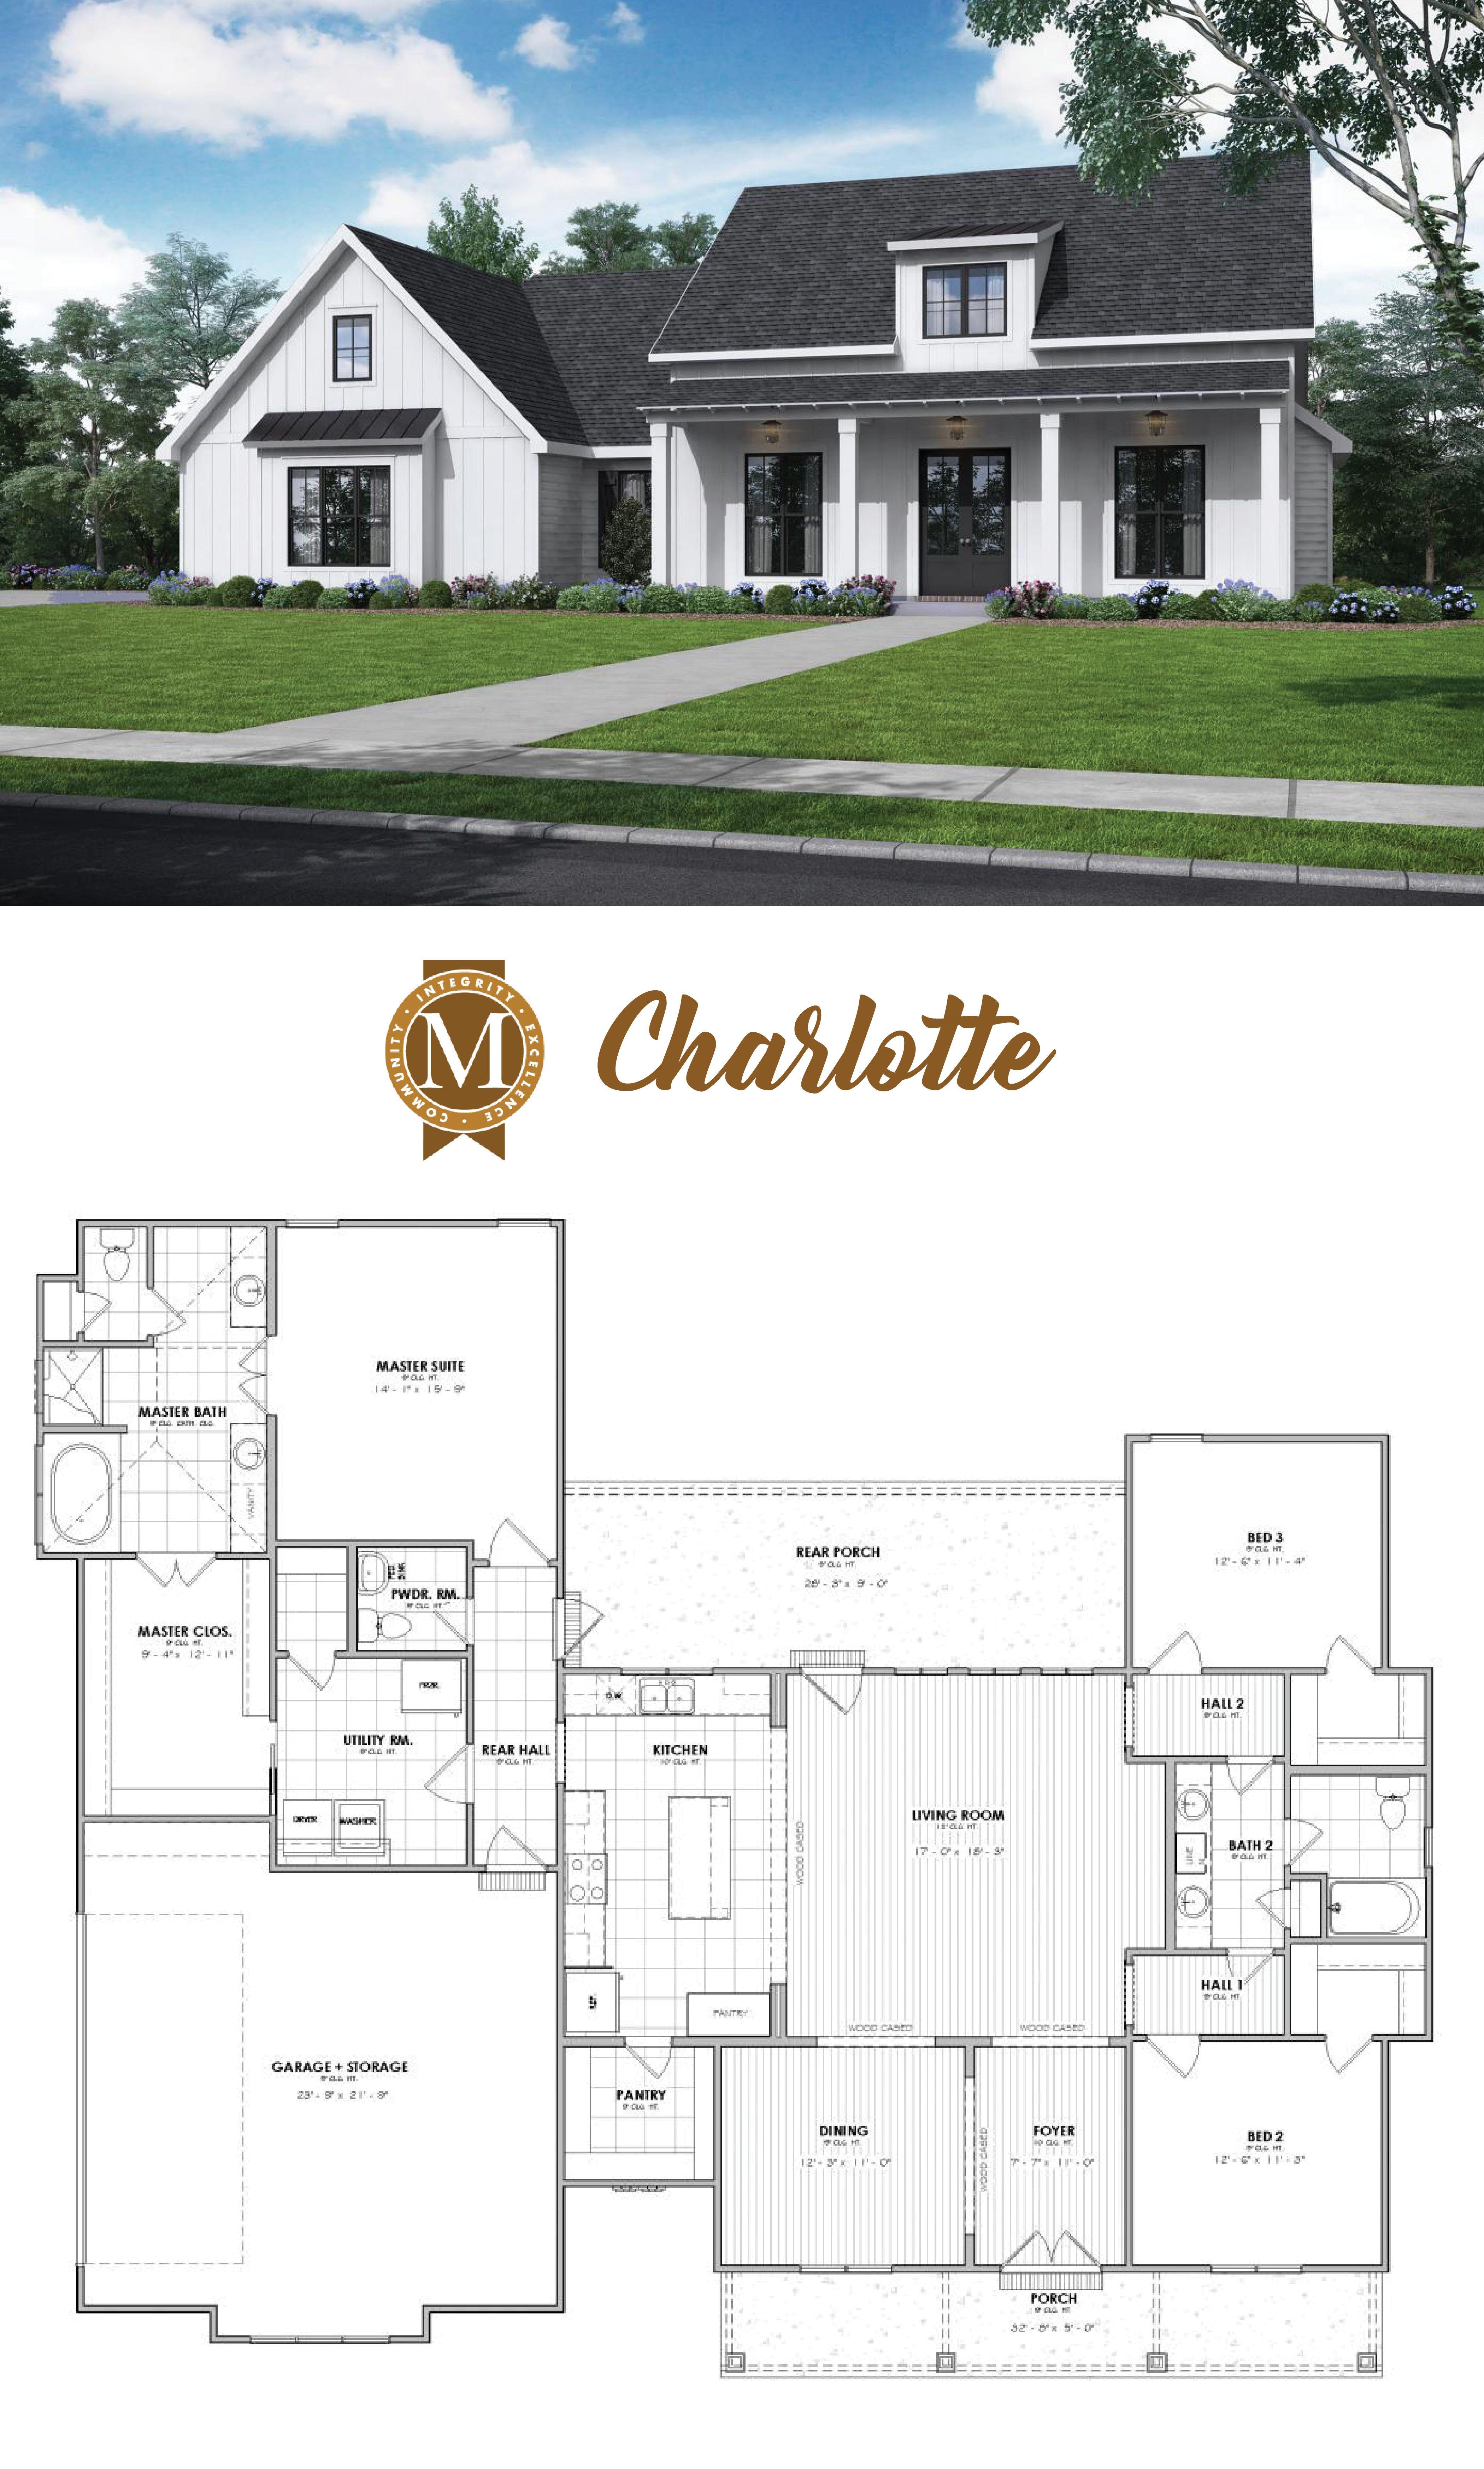 Charlotte floor plan living sq ft 2246 bedrooms 3 or 4 baths 2 5 louisiana lafayette baton rouge lake charles